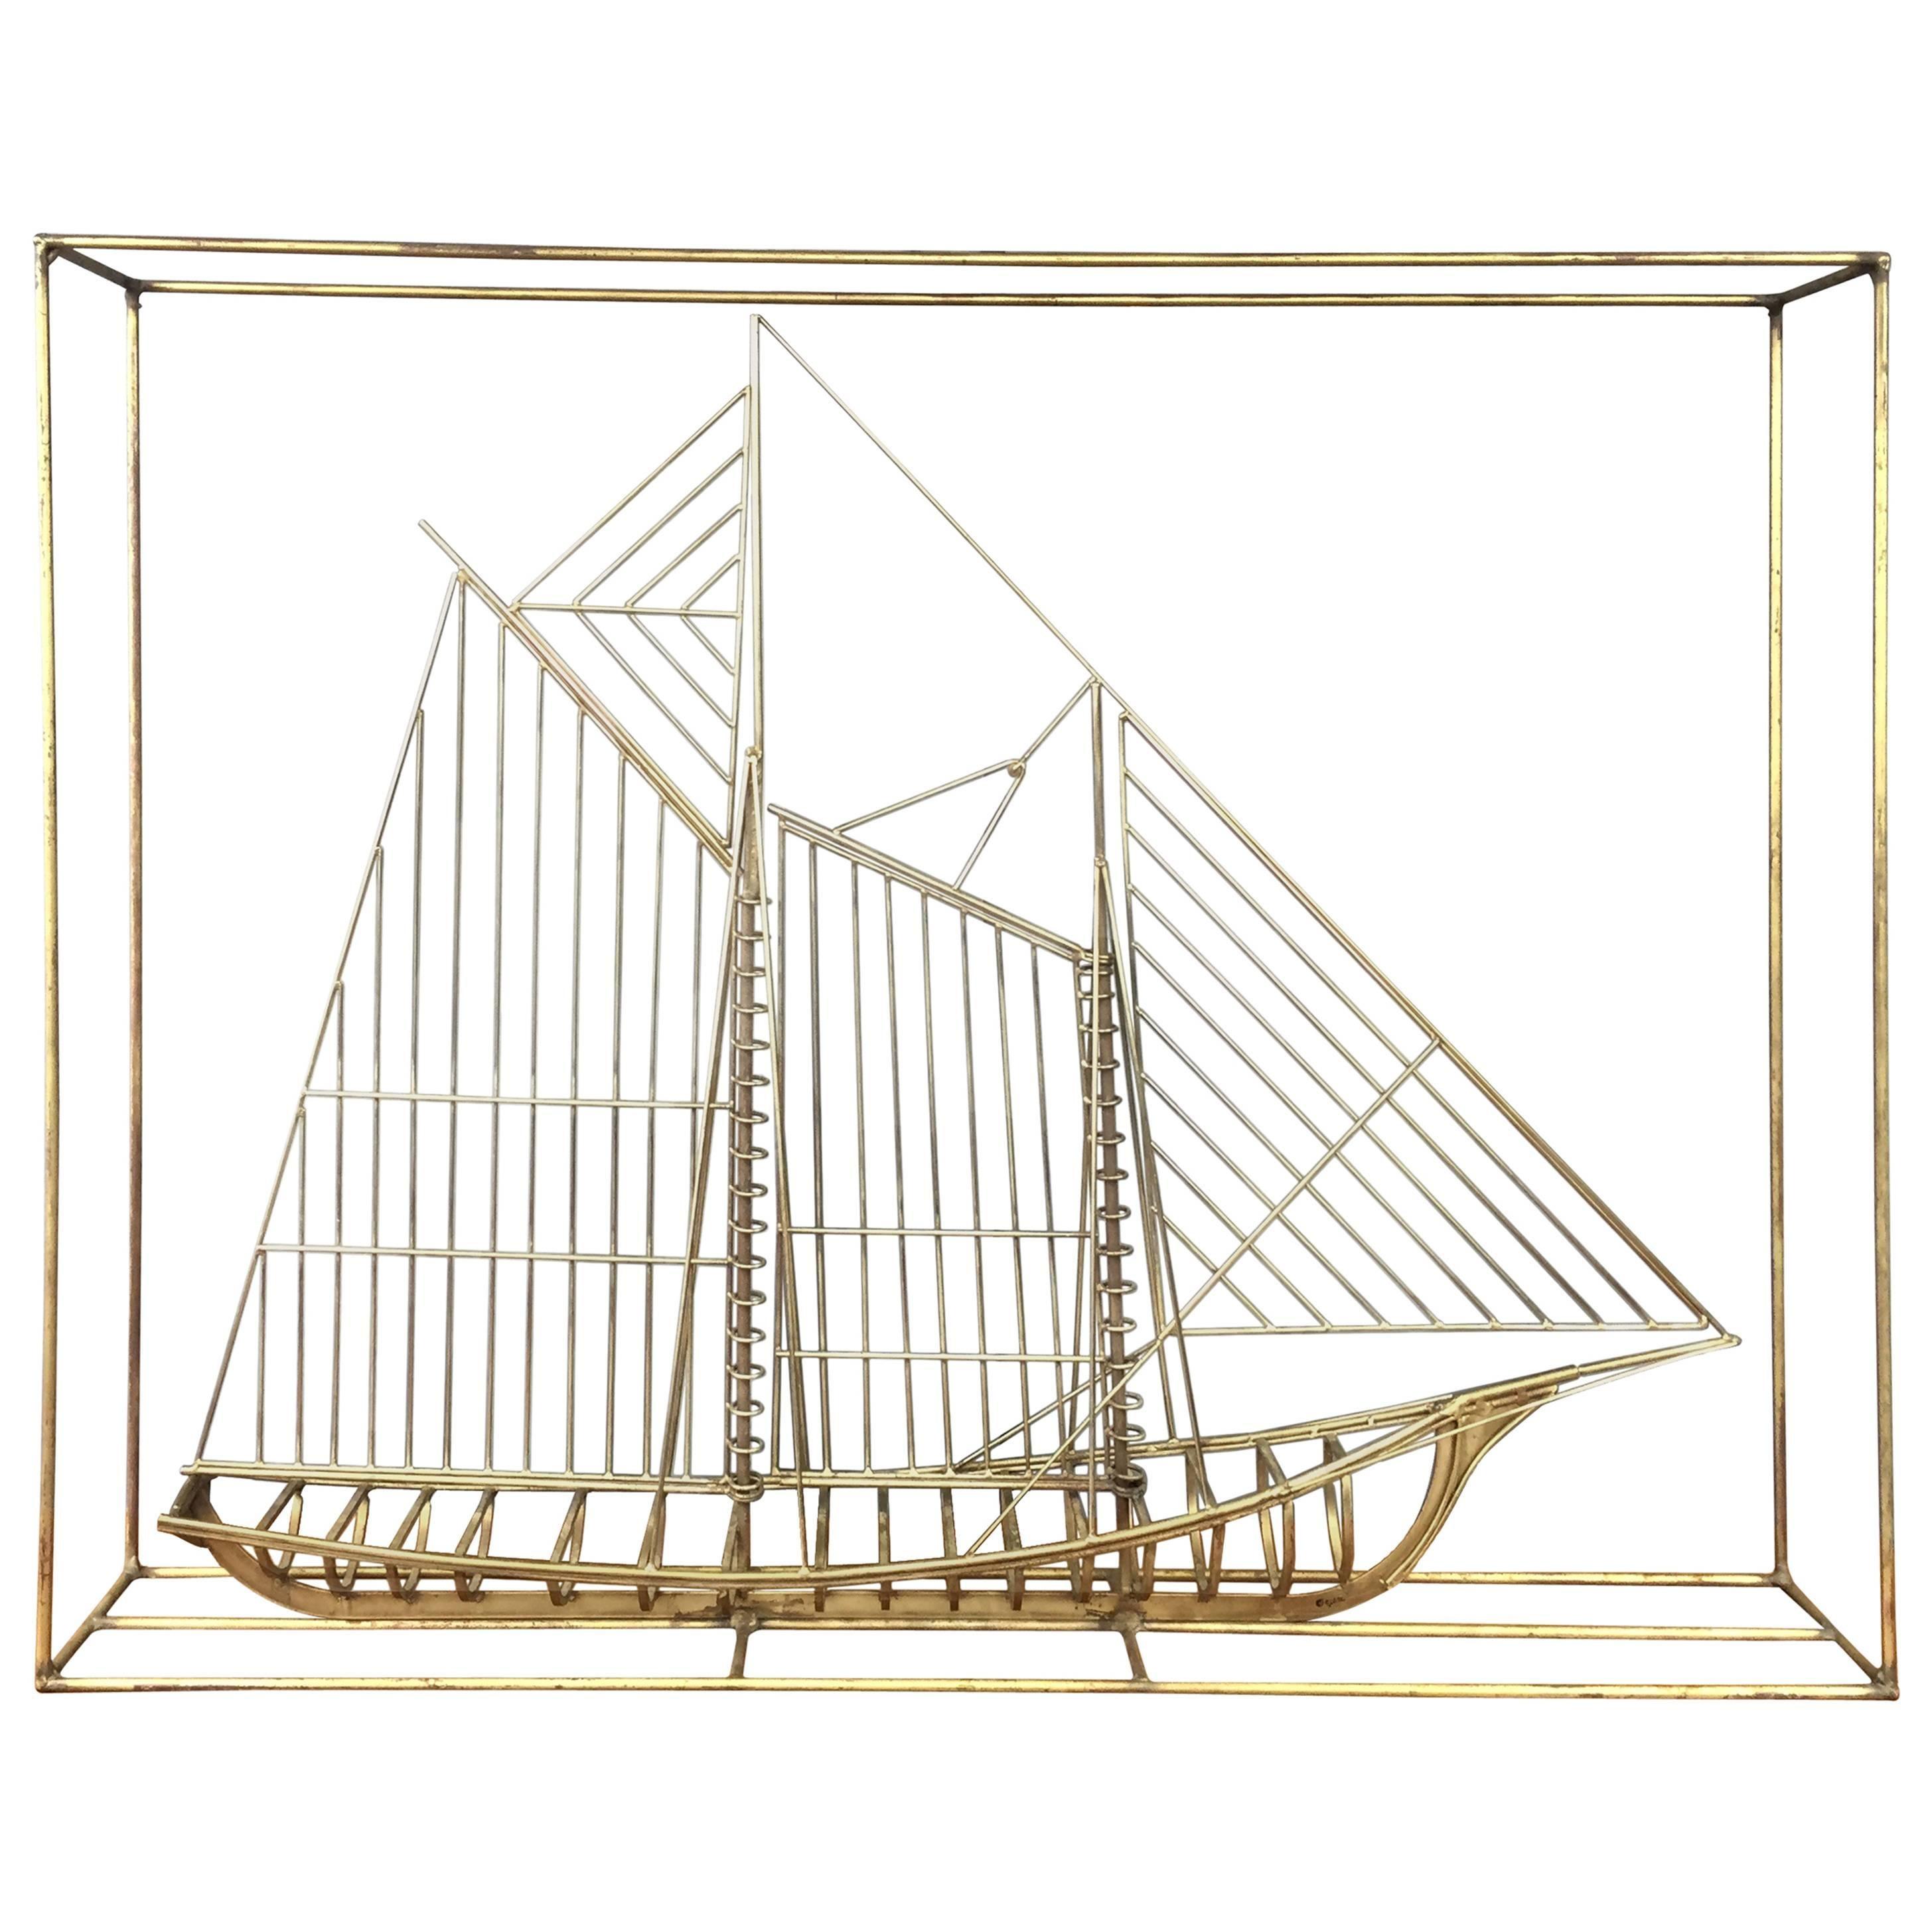 Curtis Jeré Brass-Colored Metal Clipper Ship Sculpture, Signed